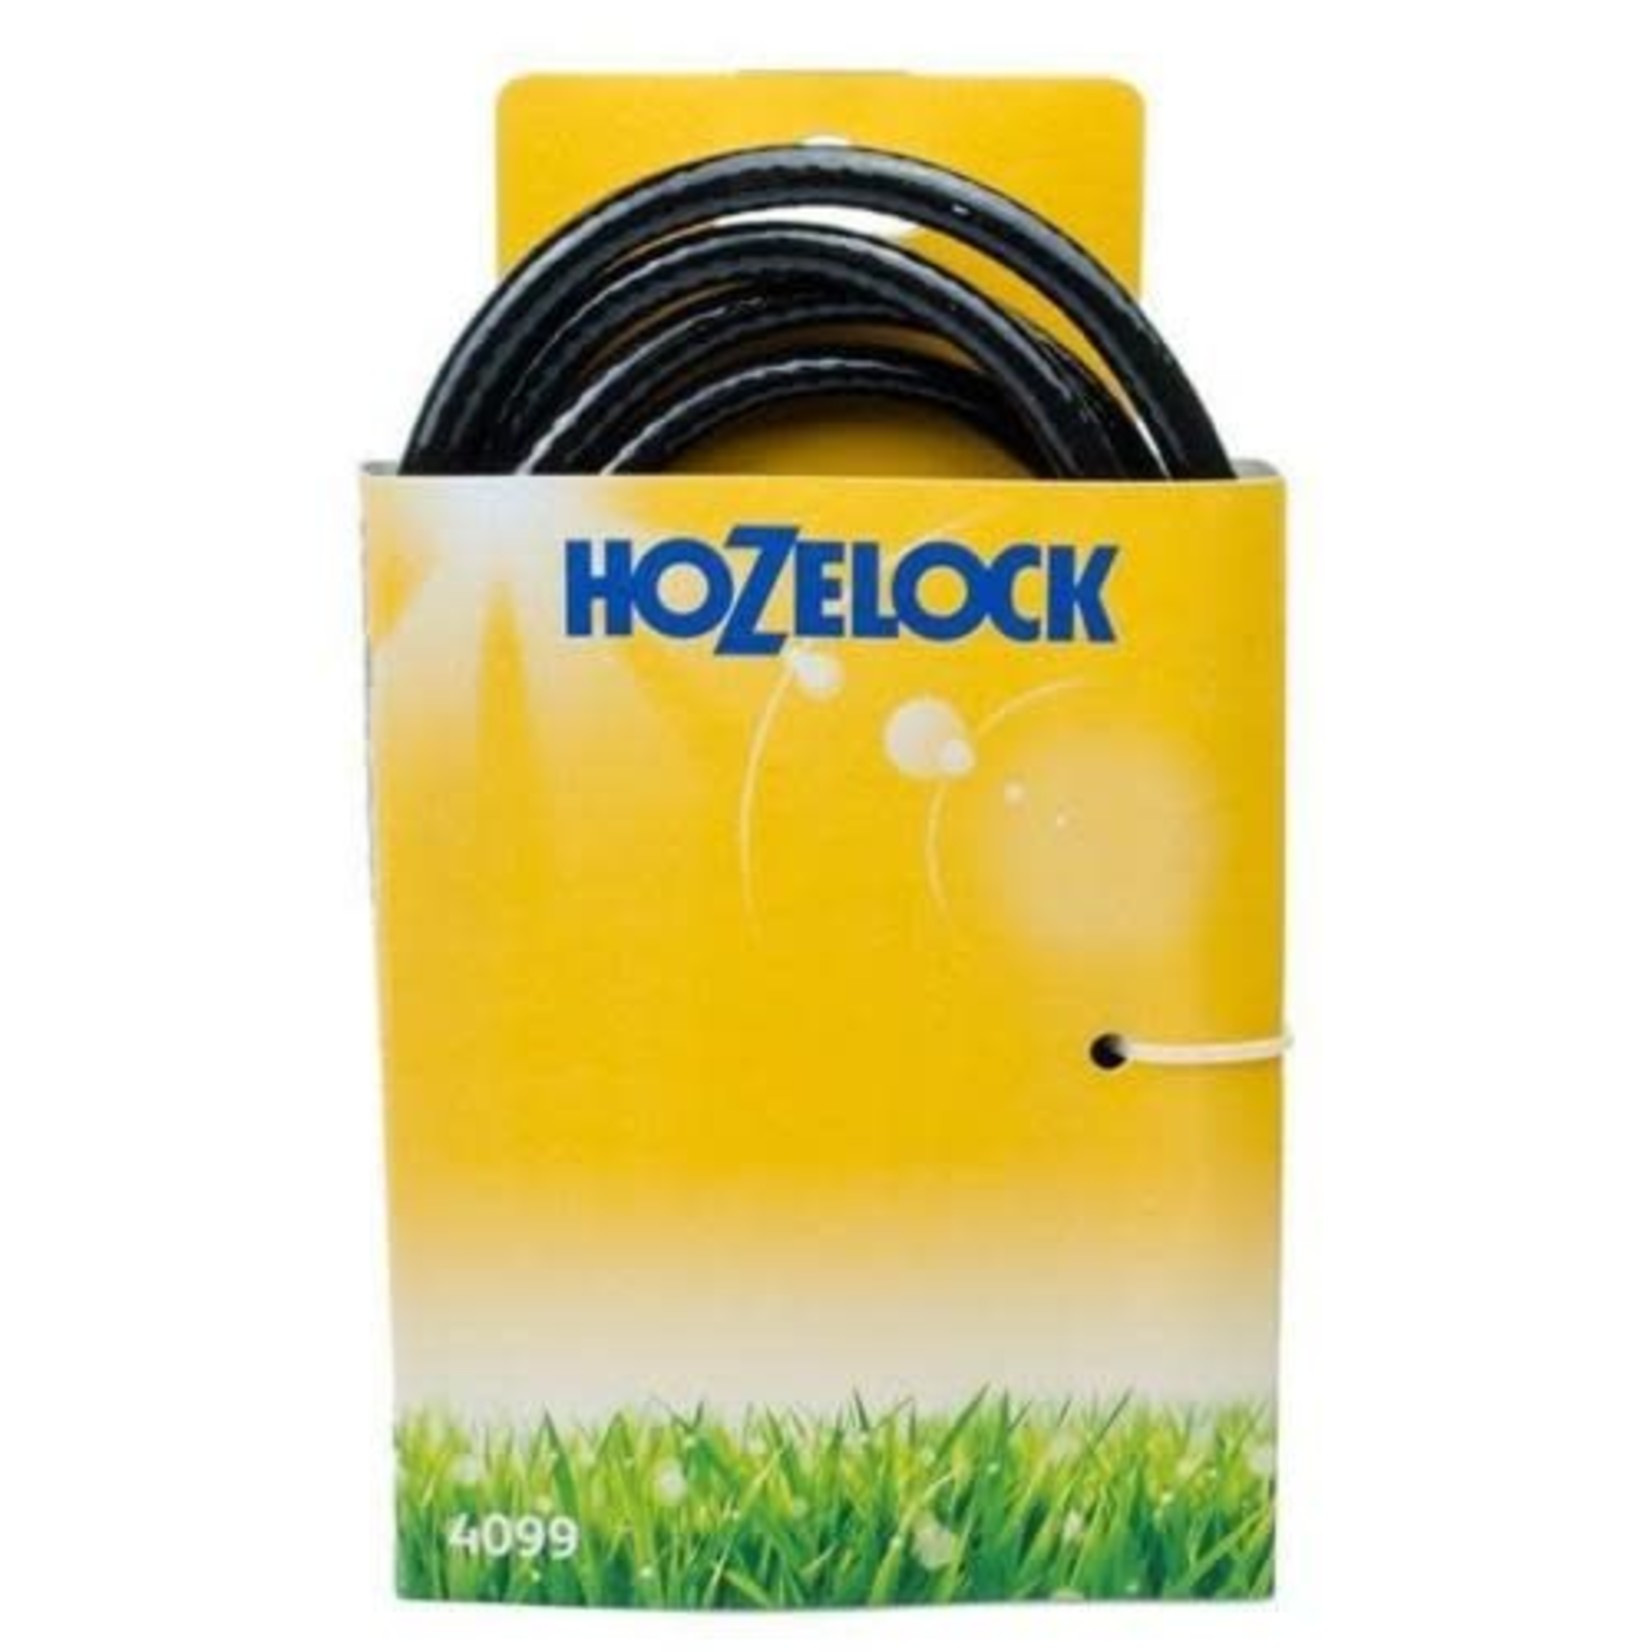 Hozelock 4099 HOZELOCK SPRAYER HOSE 2M